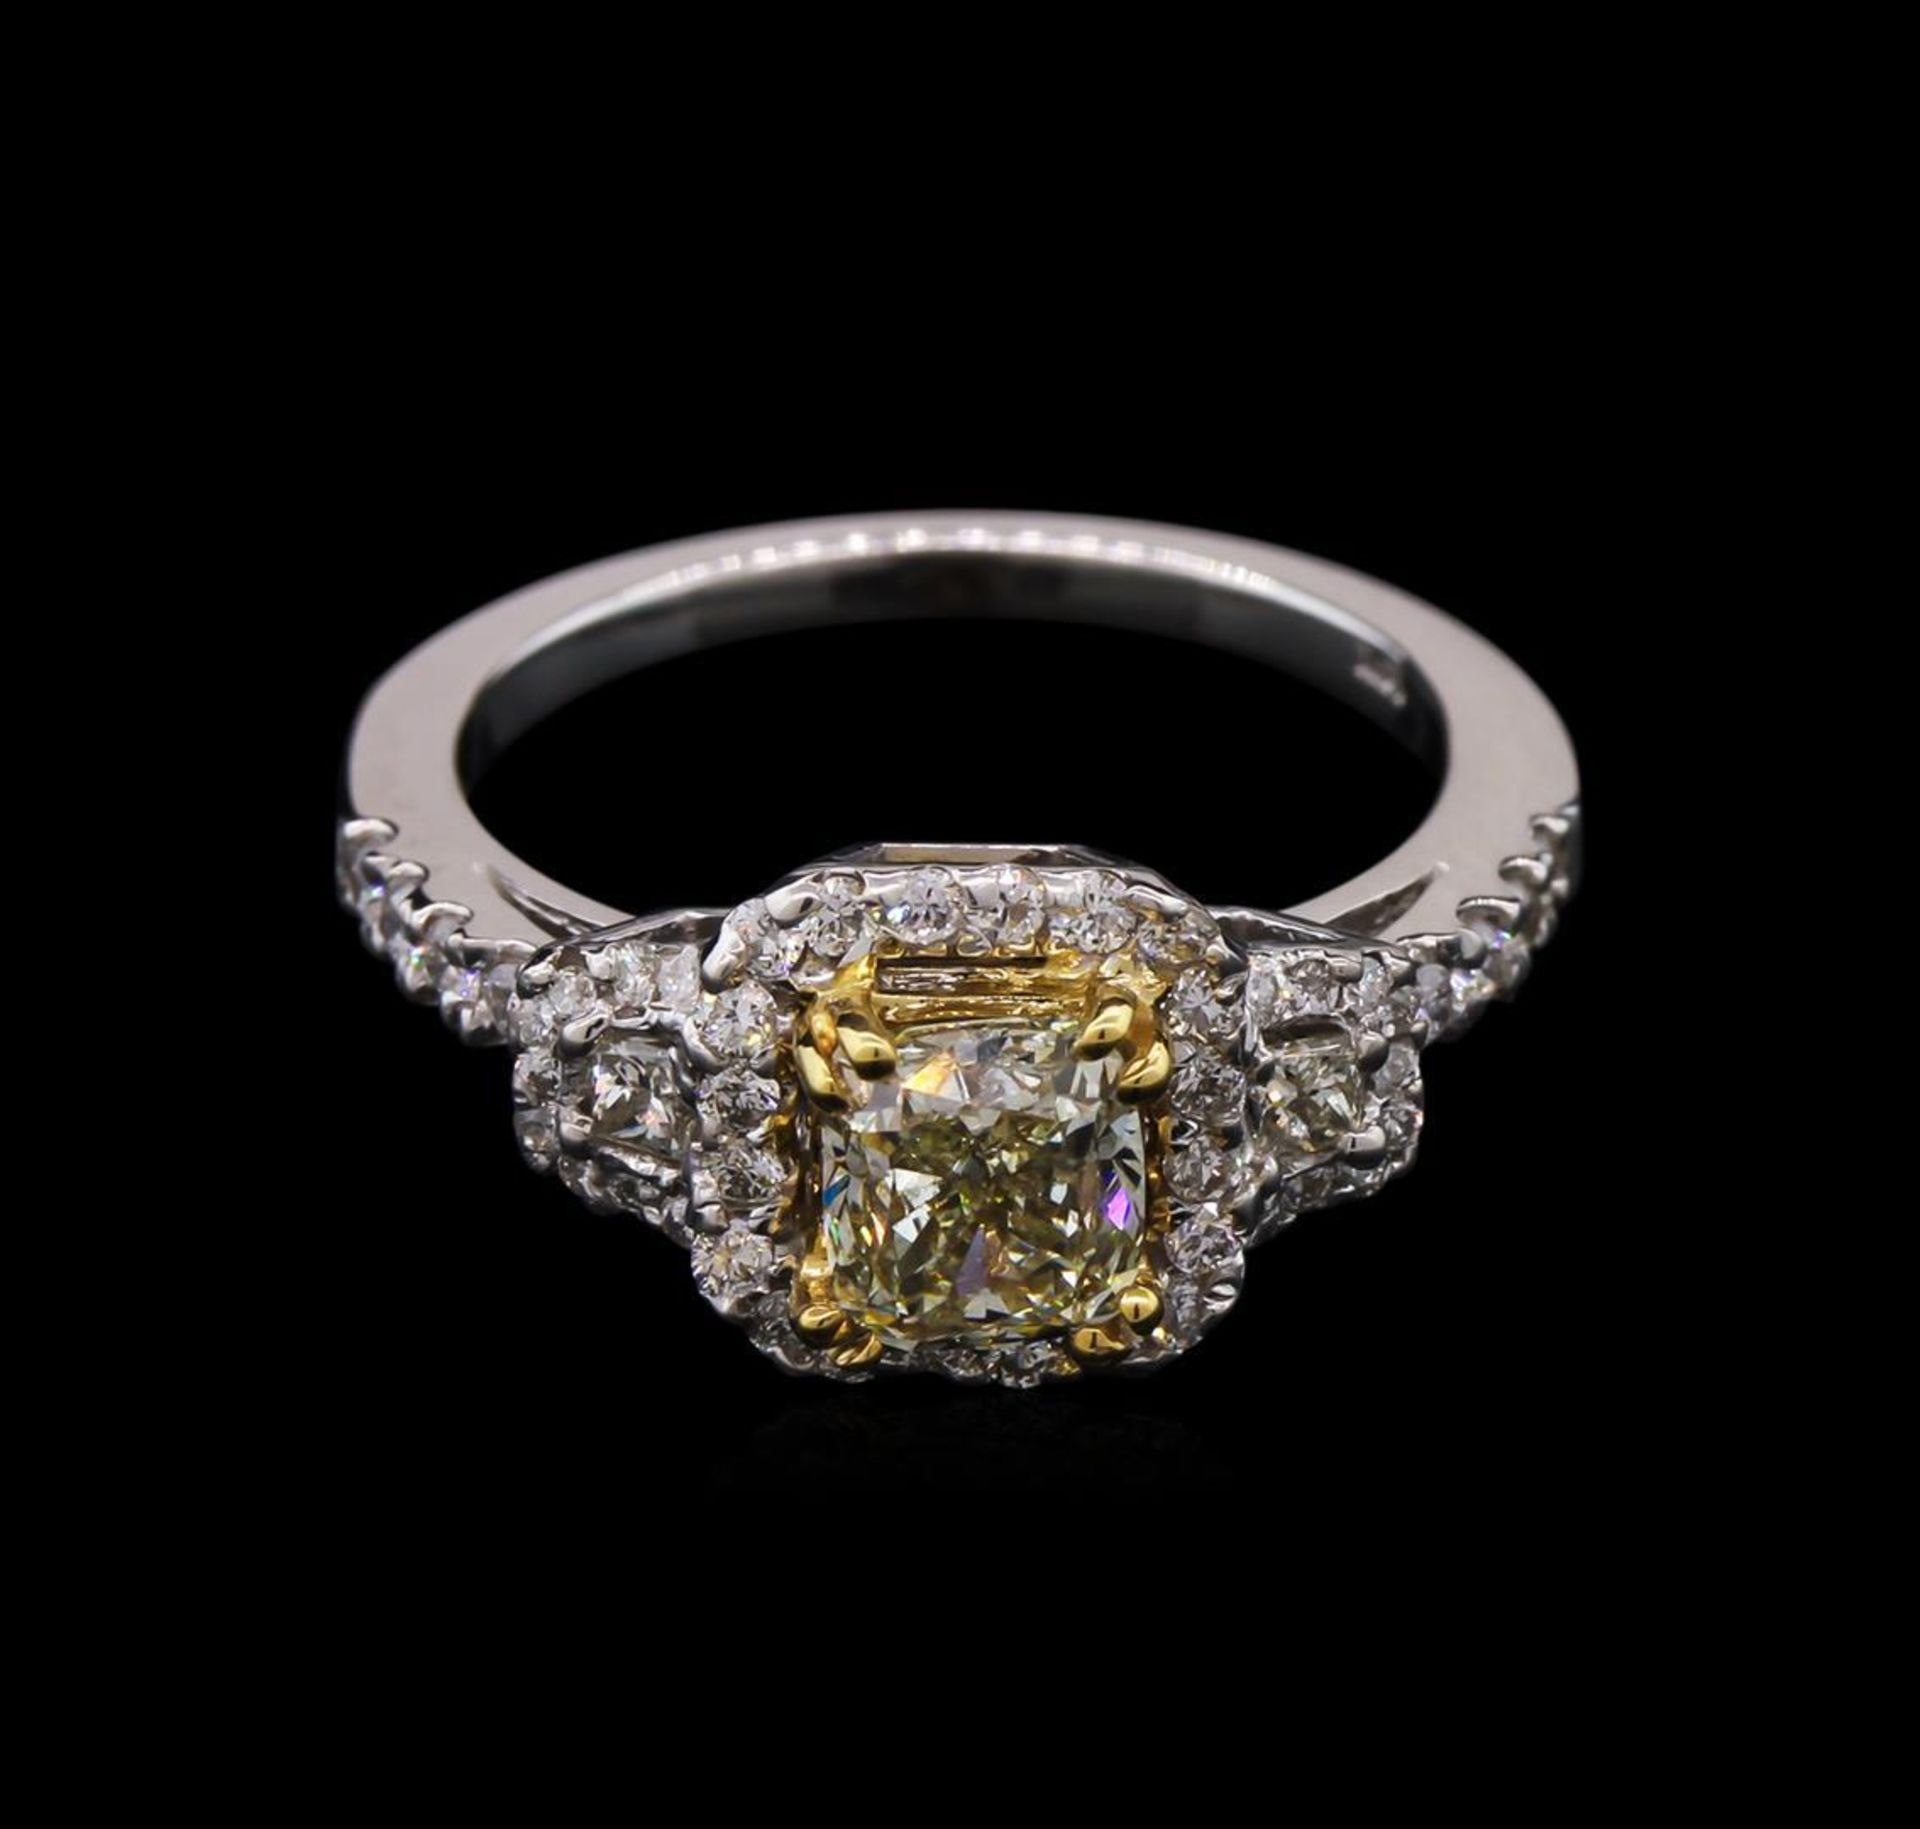 1.67 ctw Light Yellow Diamond Ring - 14KT White Gold - Image 2 of 3